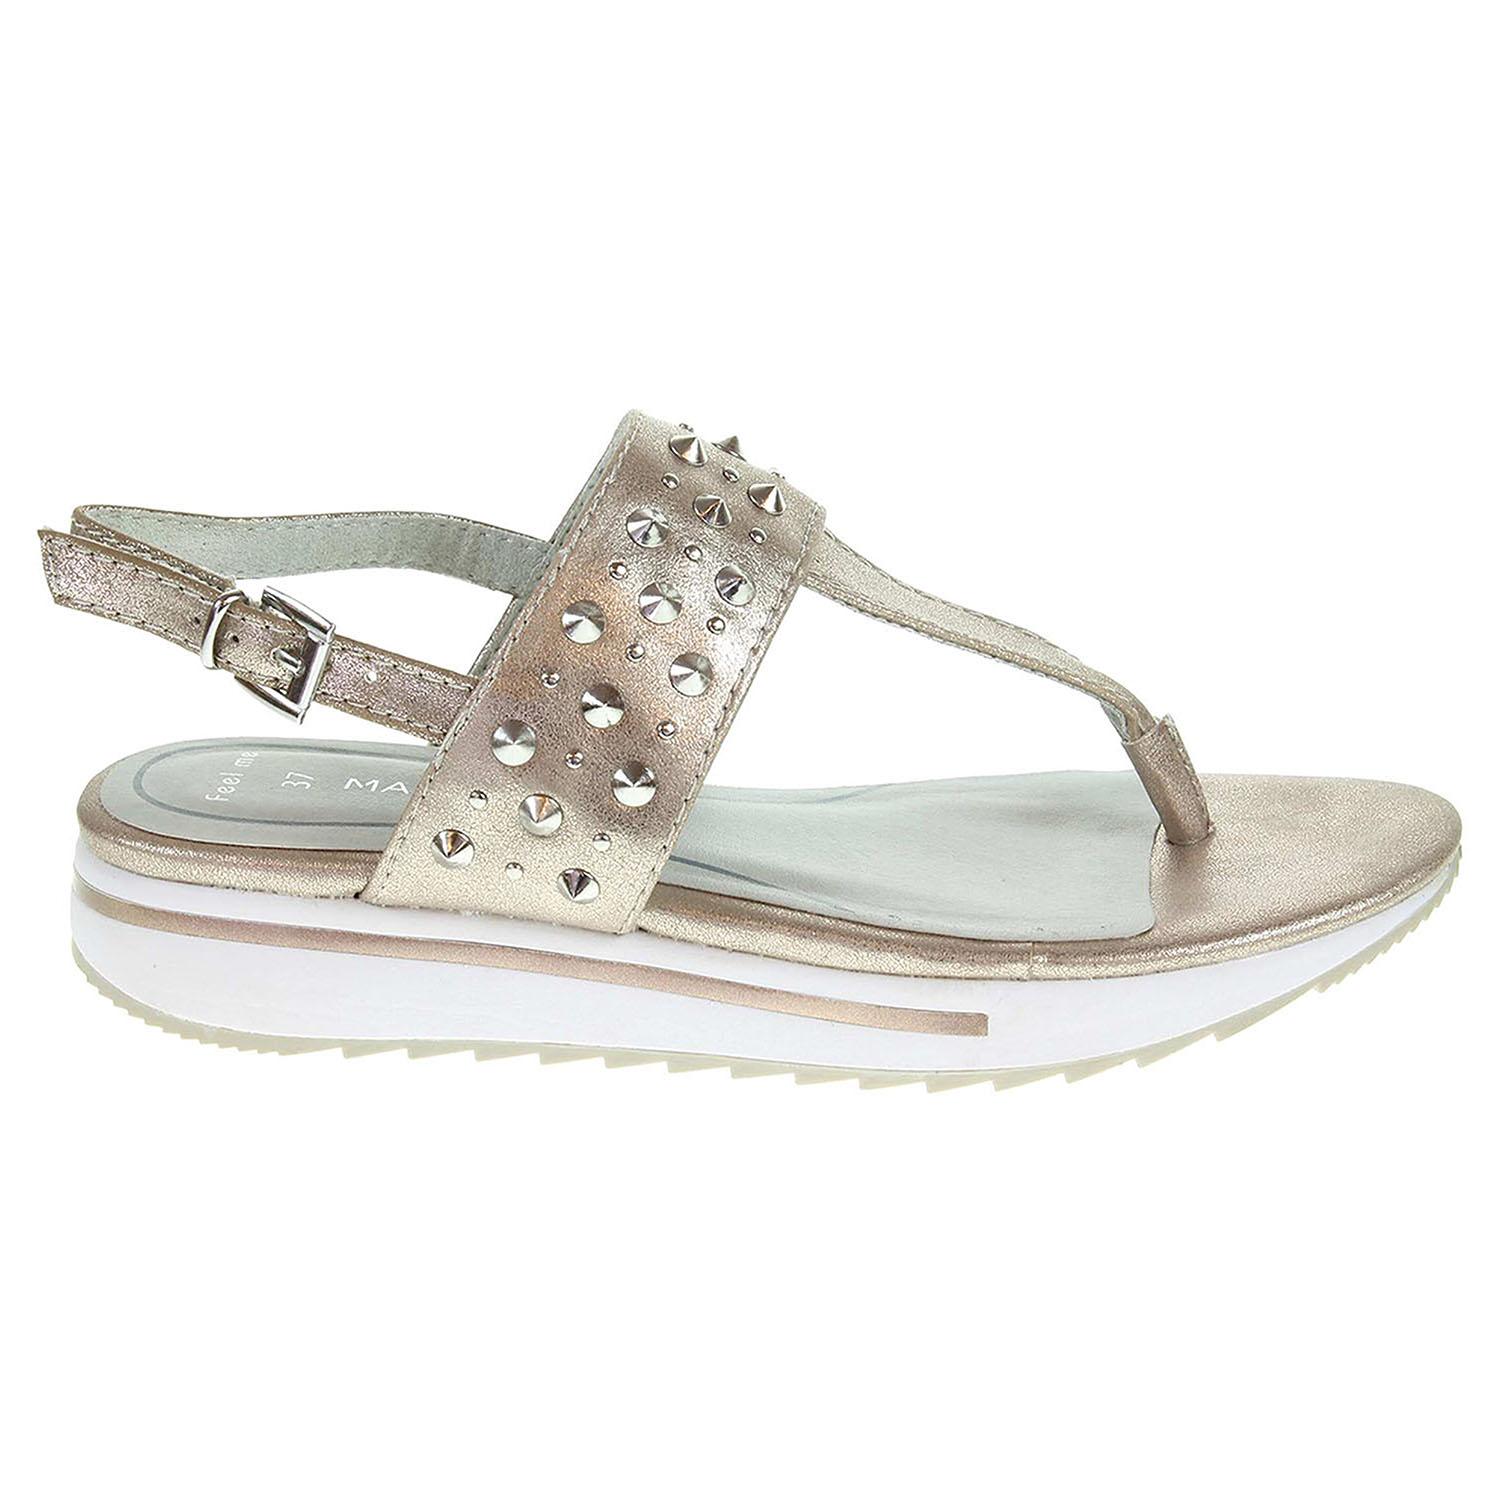 Ecco Marco Tozzi dámské sandály 2-28720-28 růžové 23801214